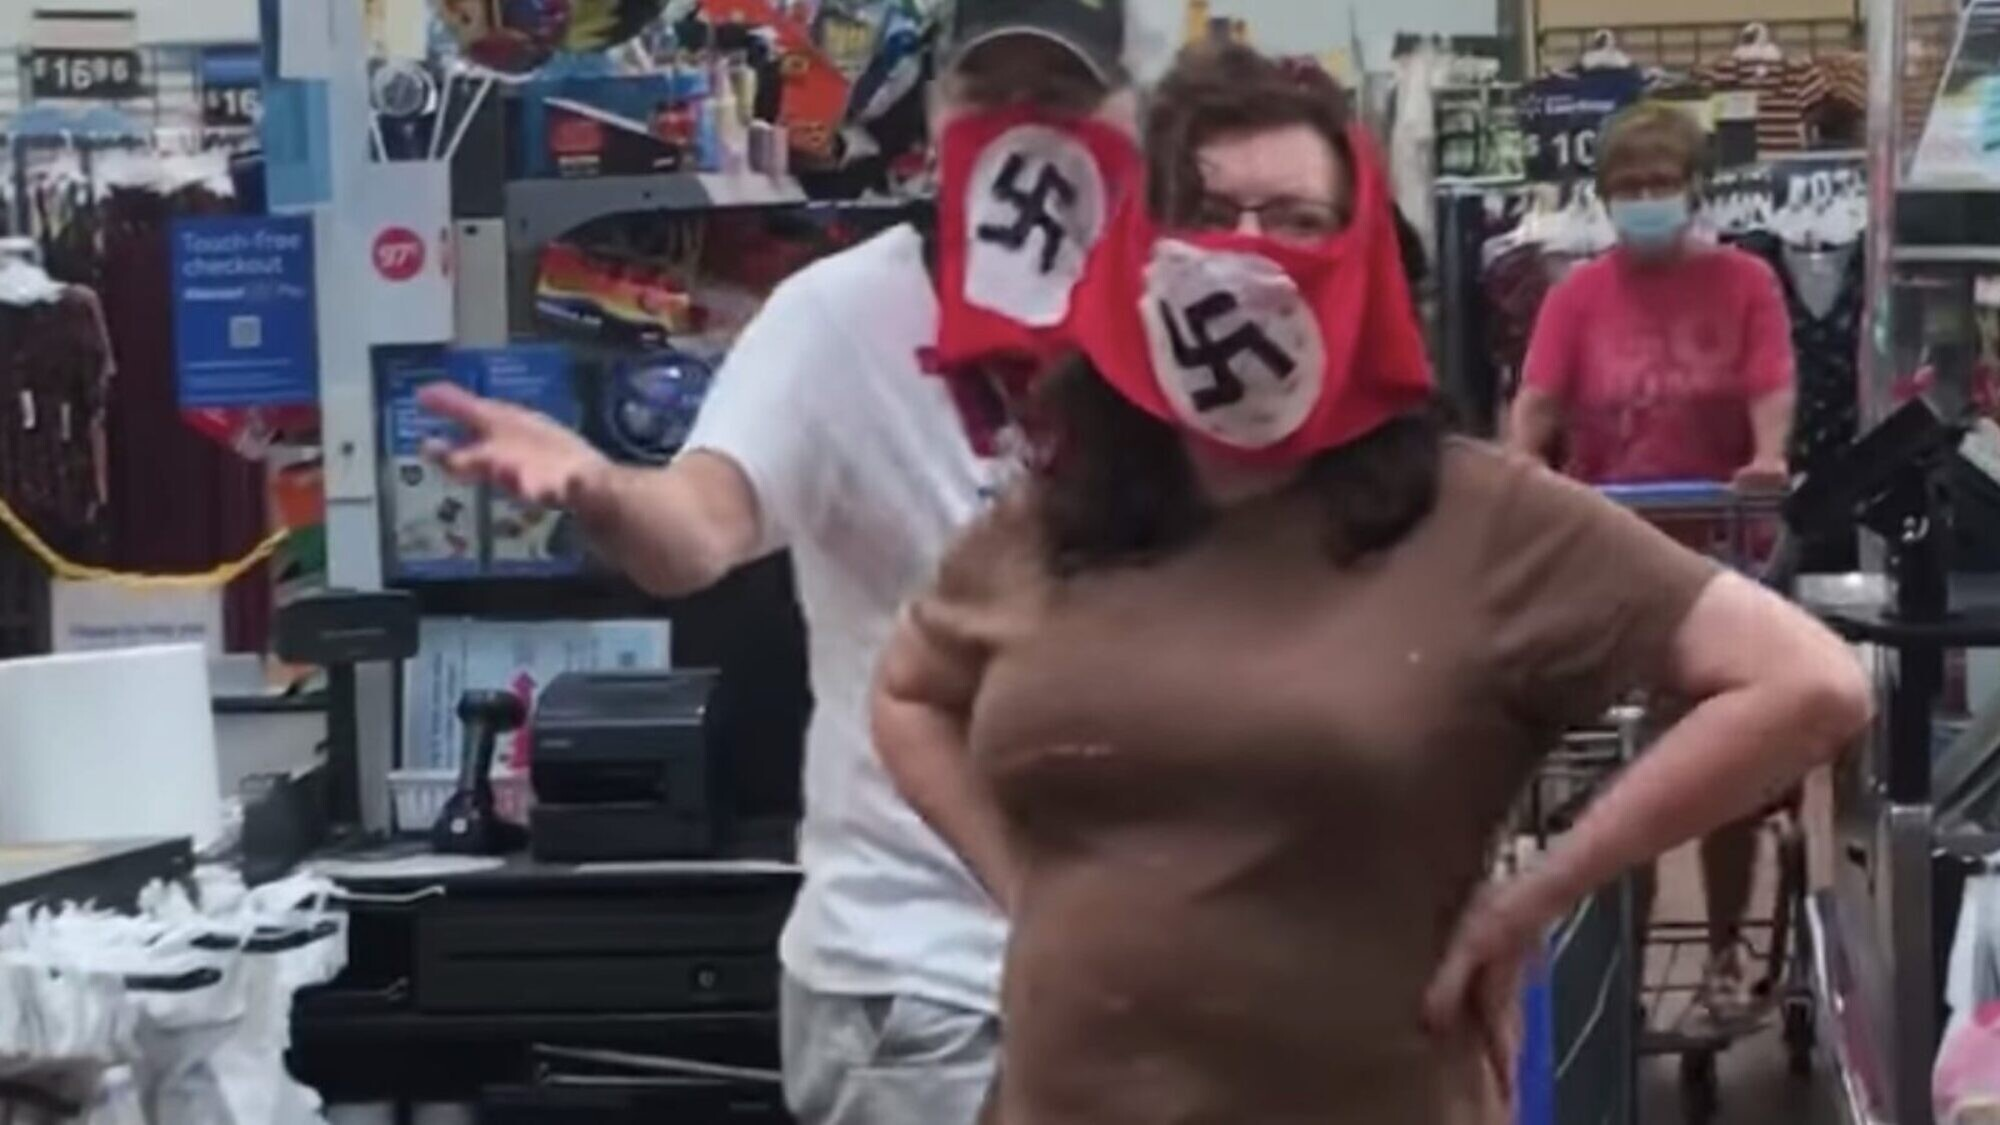 Halloween Mask Jews 2020 Jewish groups, customers denounce Nazi face masks worn in